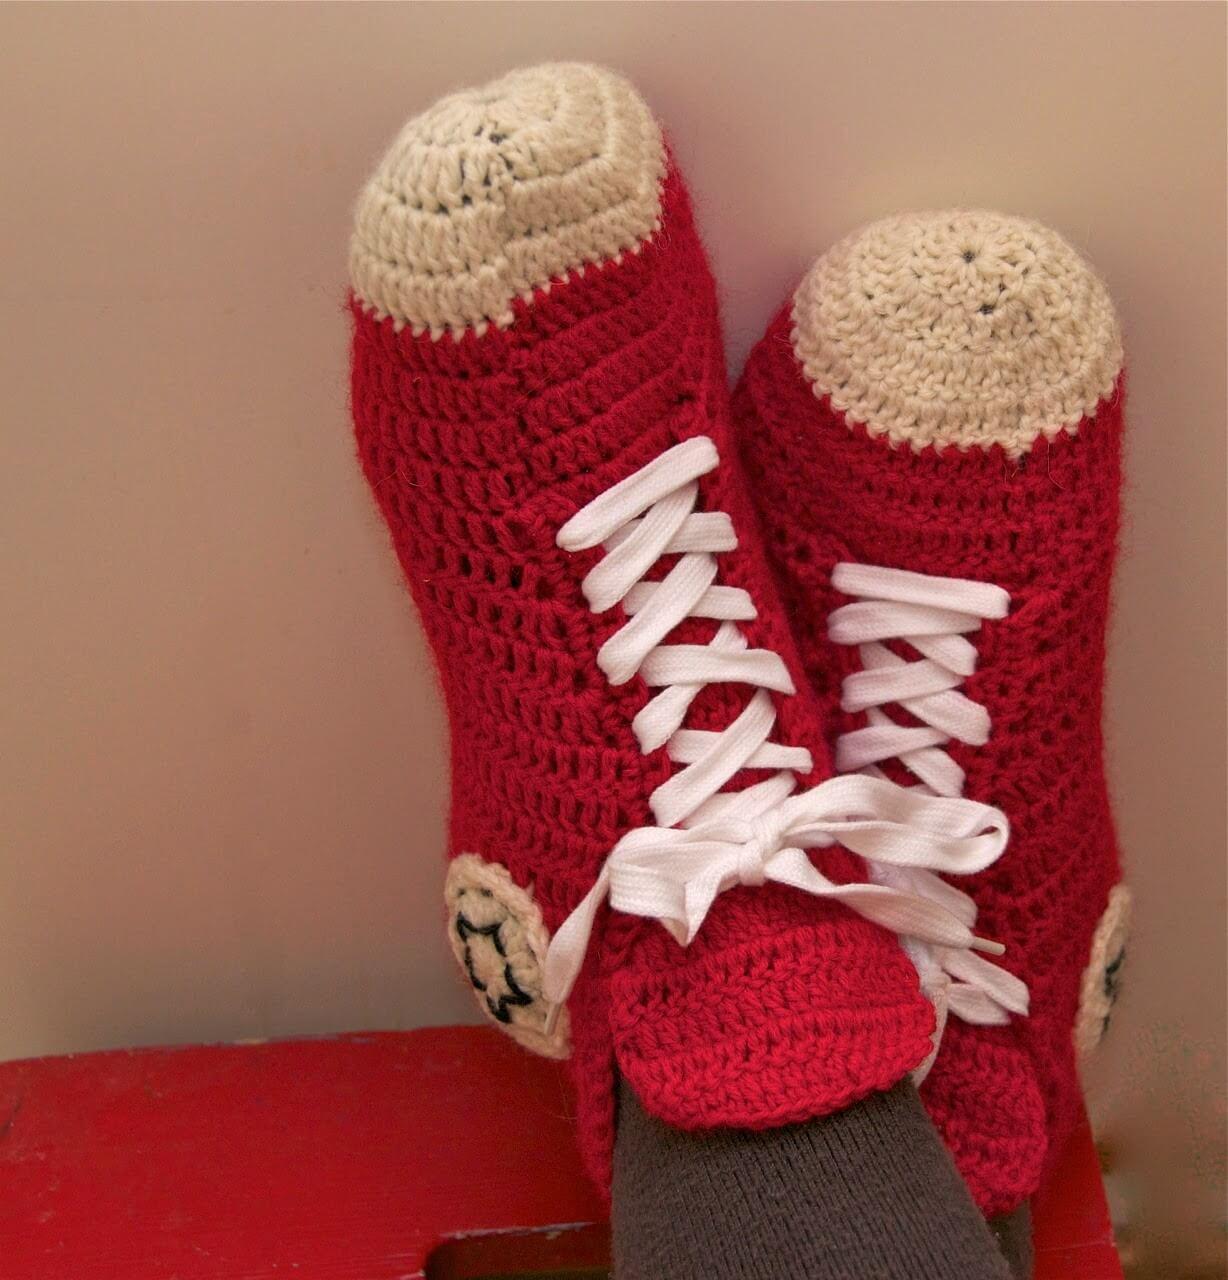 crochet converse slippers